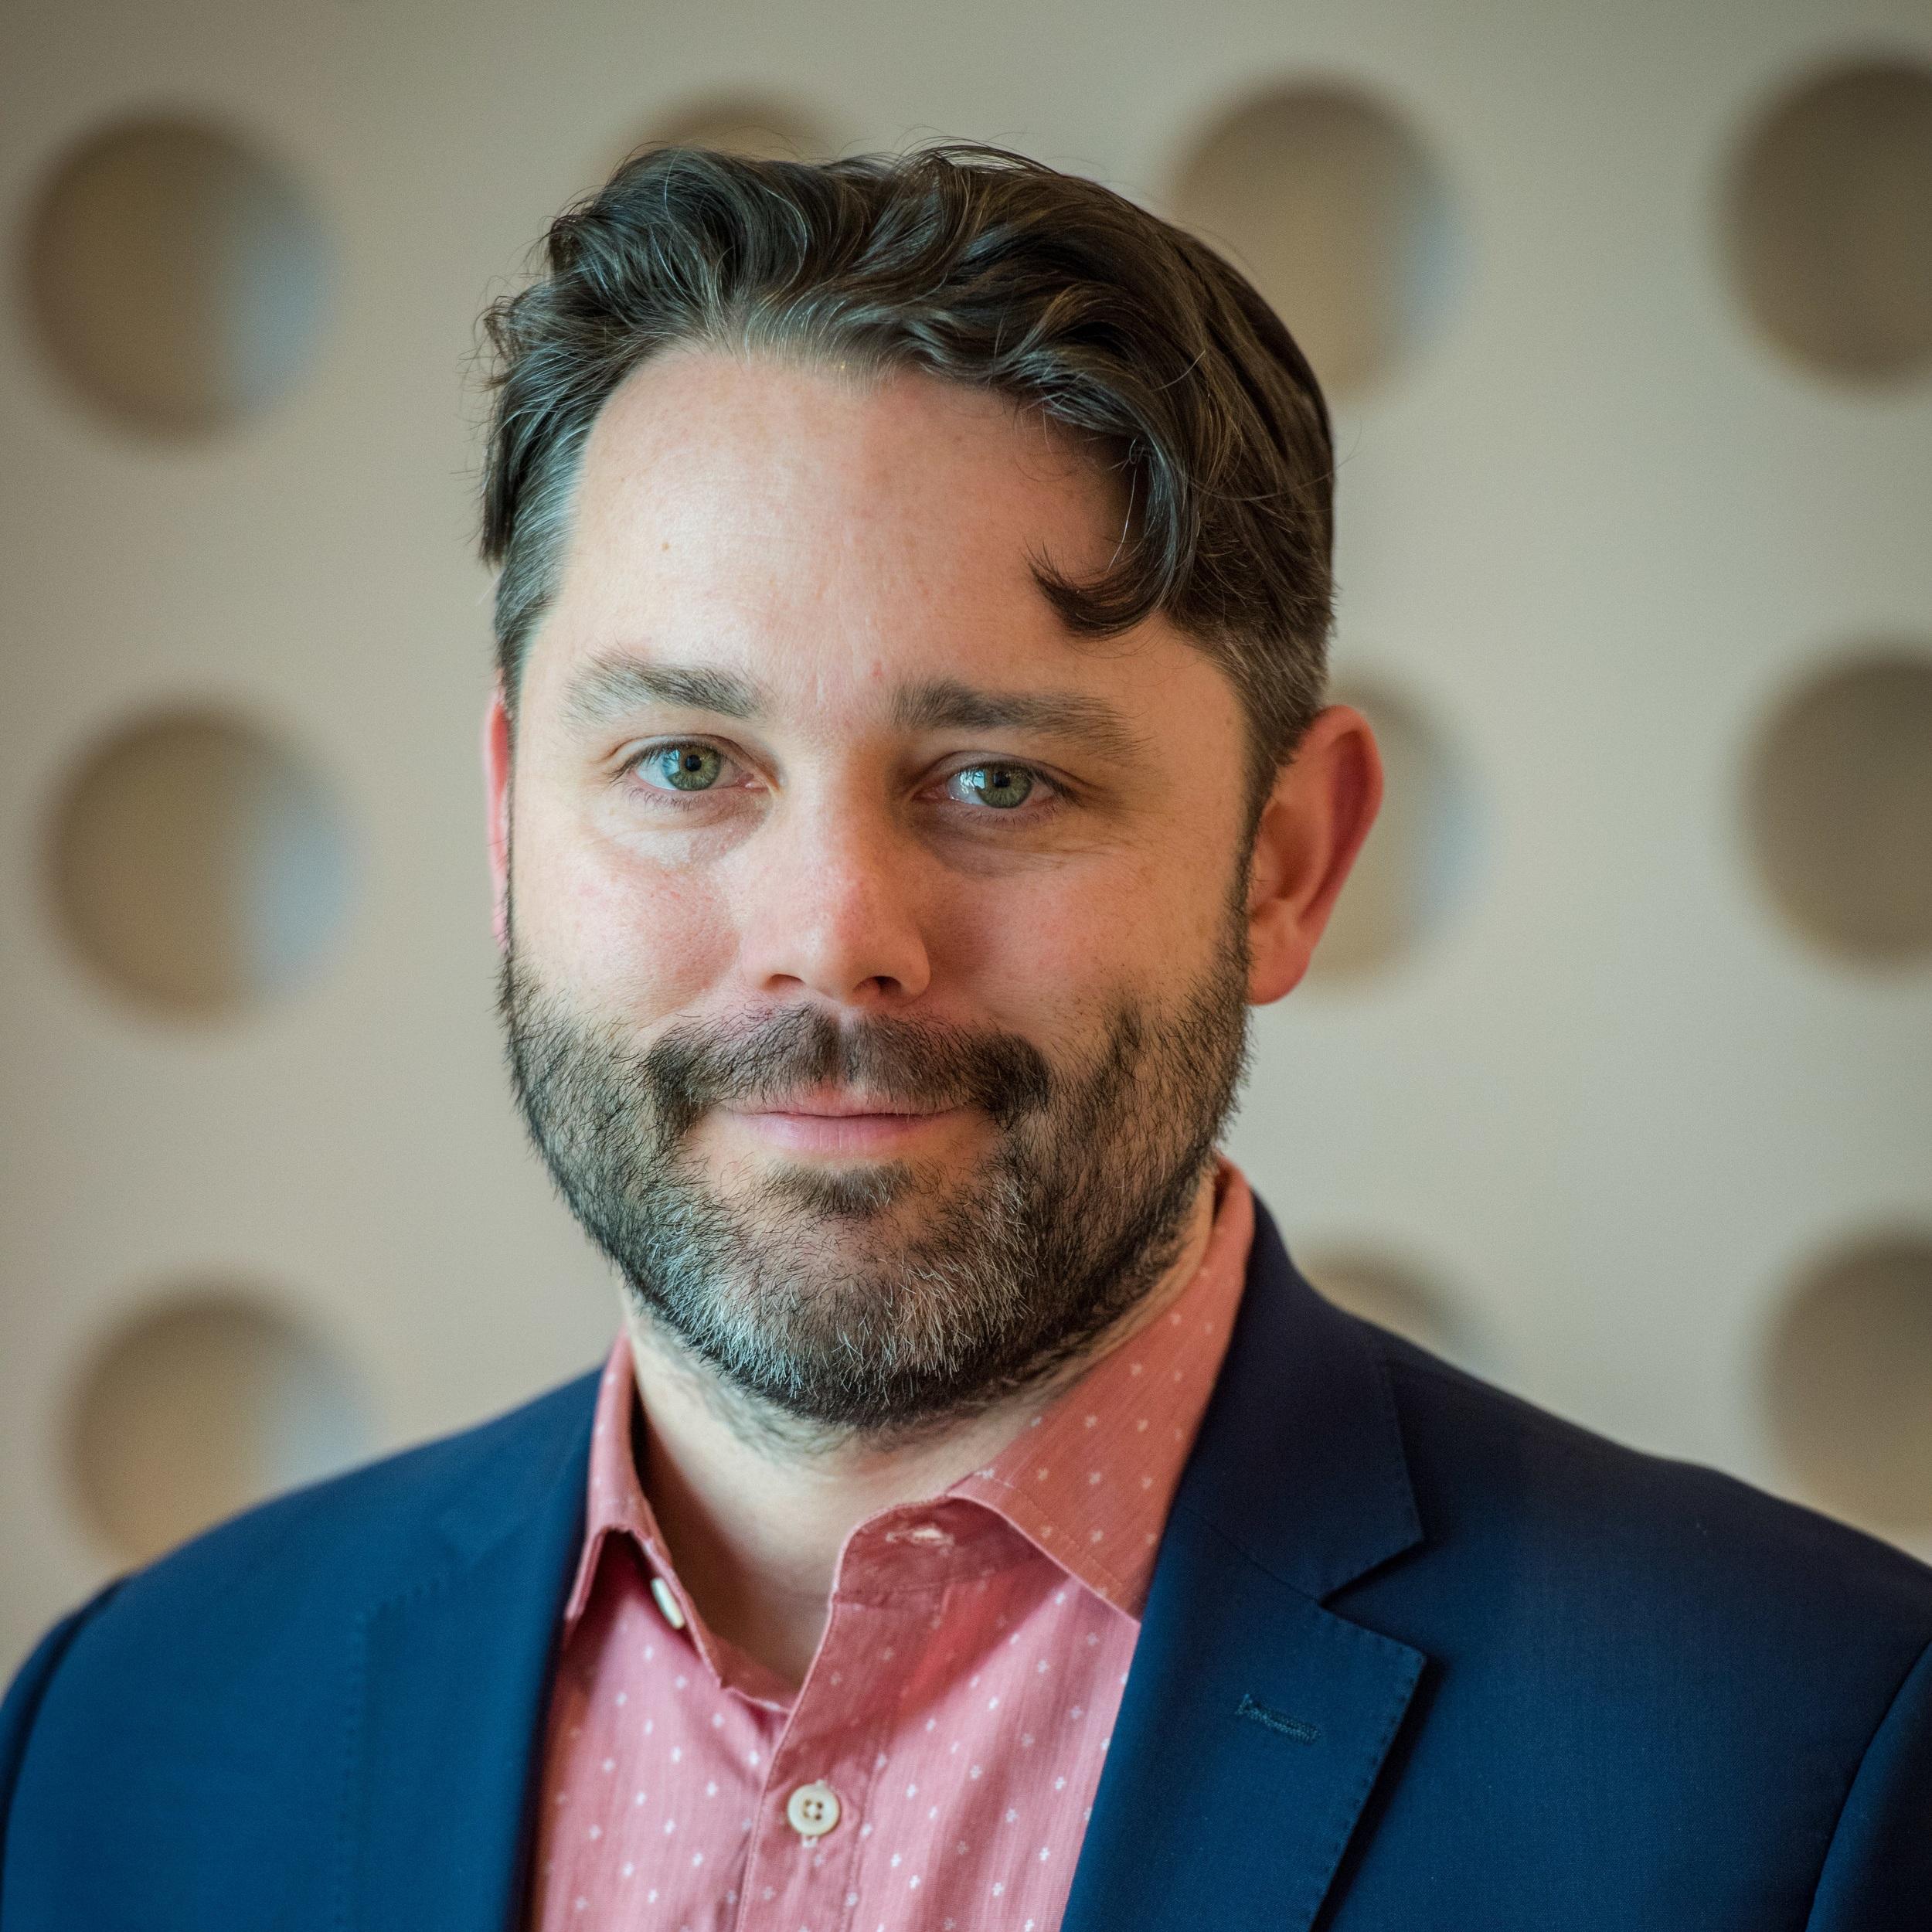 Justin Hendrix, Executive Director, NYC Media Lab